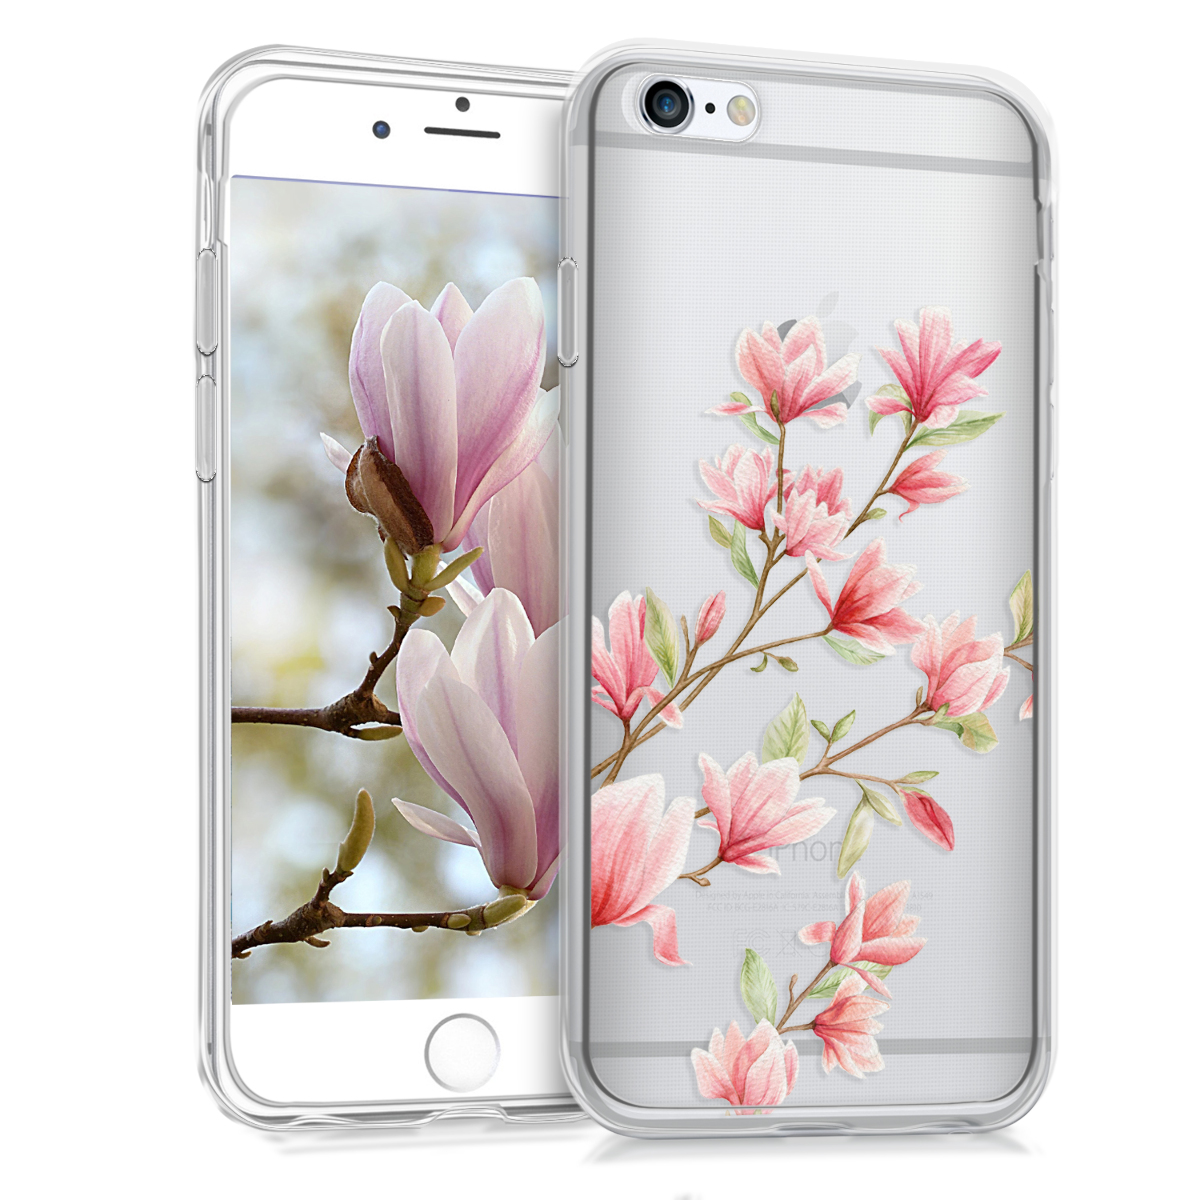 KW Θήκη Σιλικόνης Apple iPhone 6 / 6S - Light Pink / White / Transparent (37850.04)